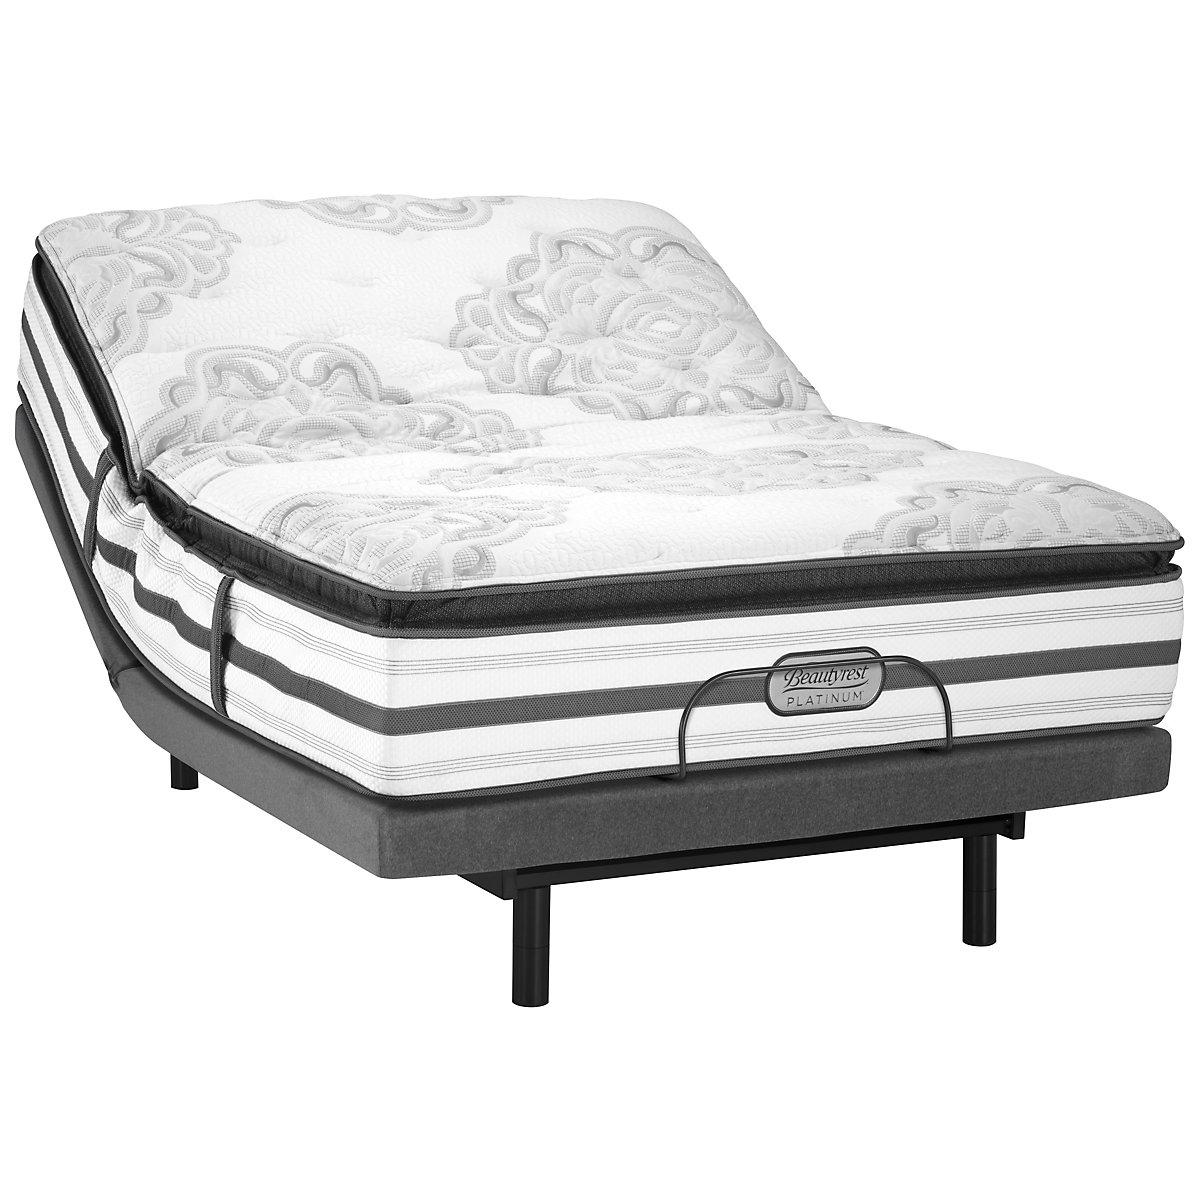 Beautyrest Platinum Gabriella Plush Innerspring Deluxe Adjustable Mattress Set